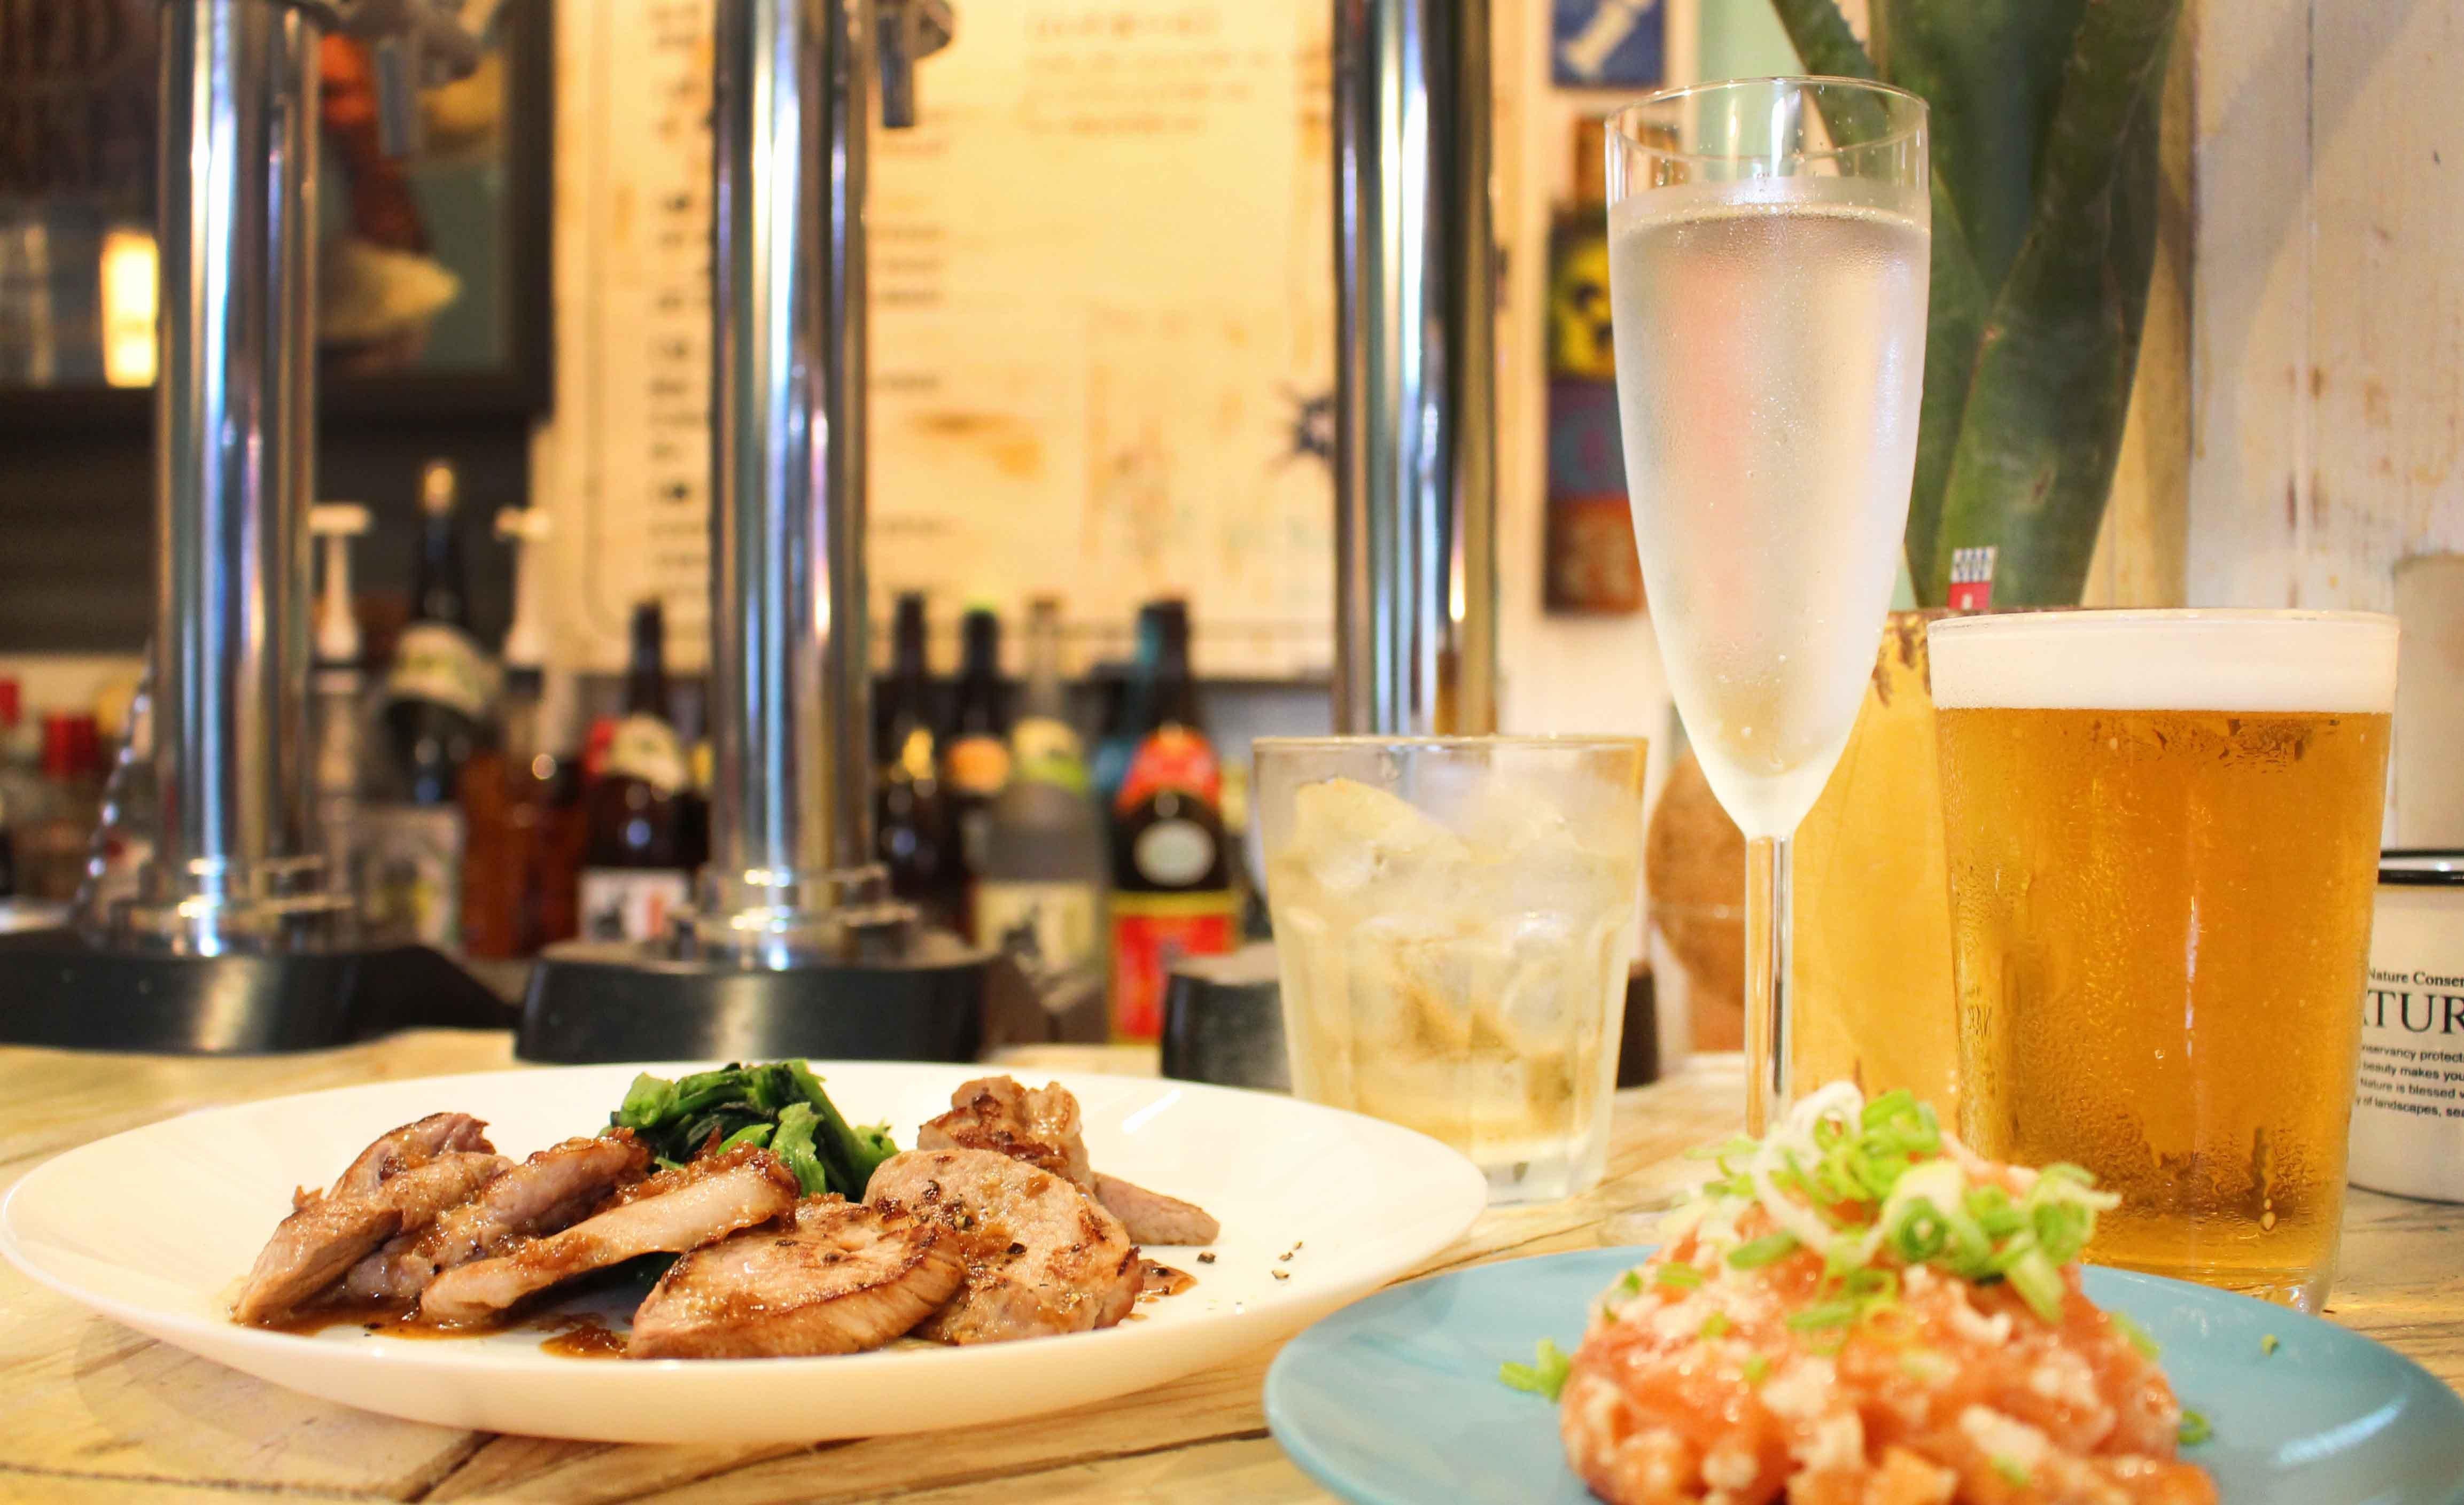 Sinada-高CP值|三杯酒 + 美味agu豬排 + 小菜